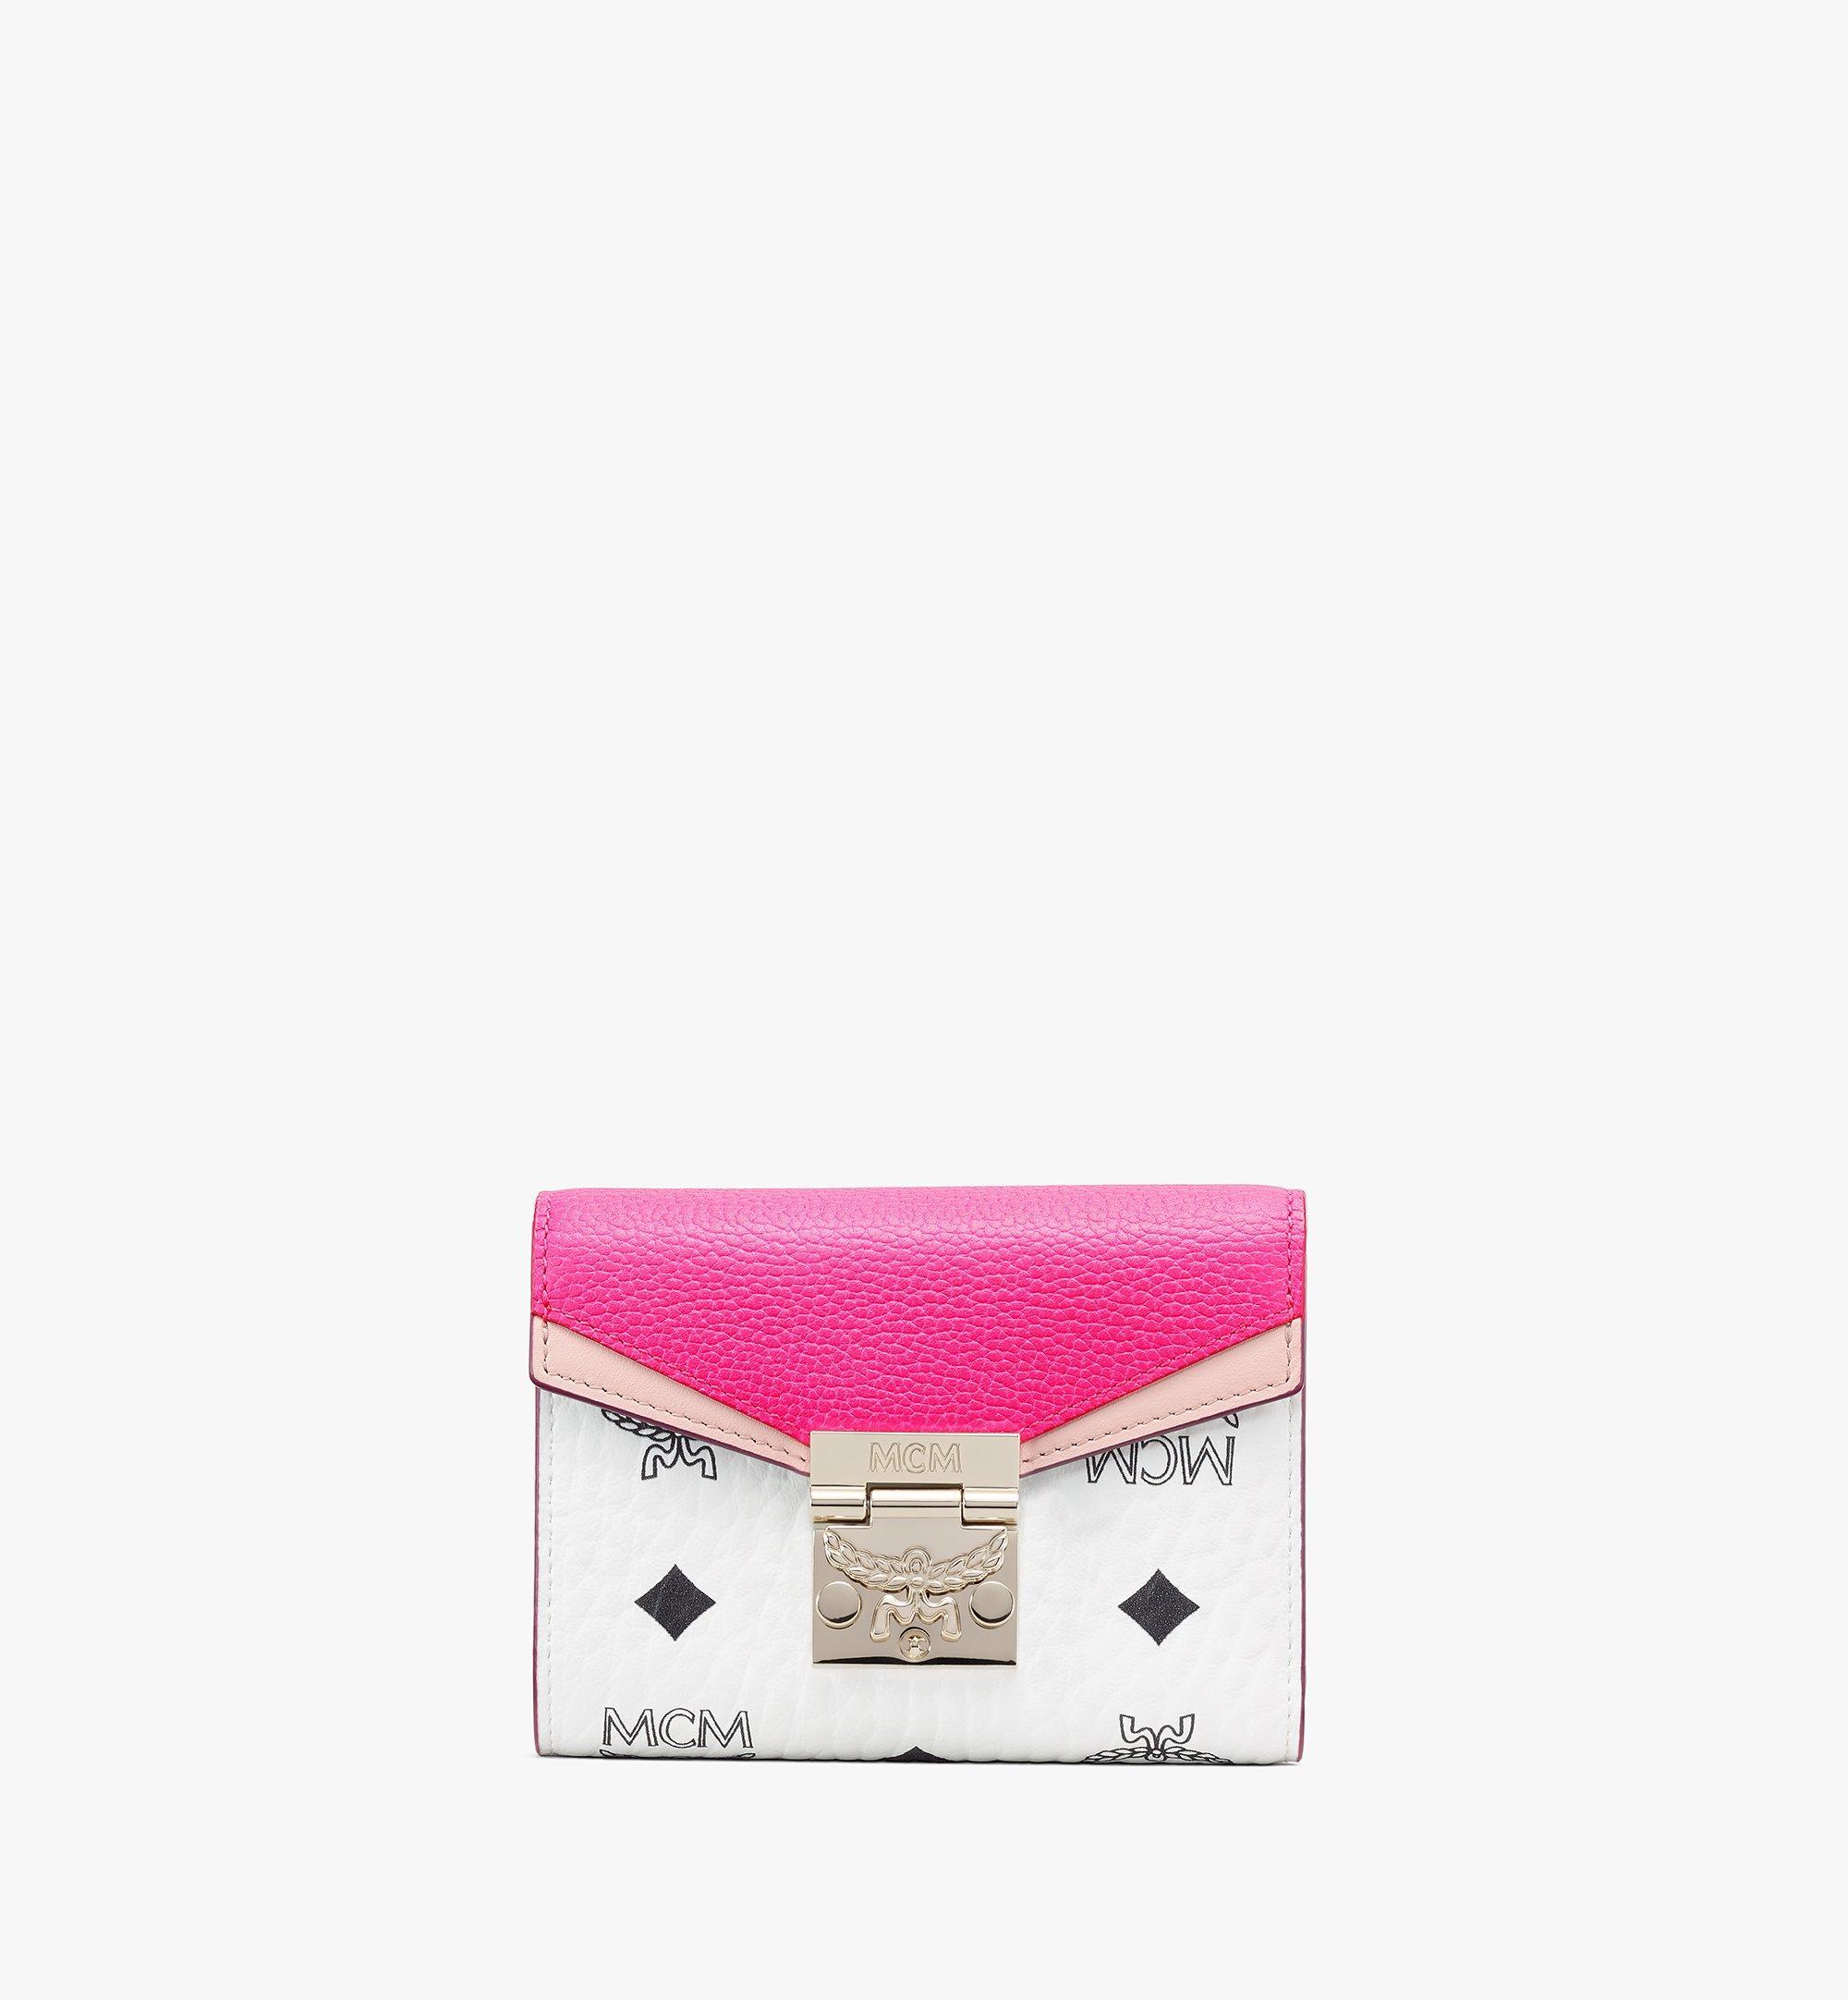 MCM Patricia Trifold Wallet in Color Block Visetos Pink MYSAAPA04QJ001 Alternate View 1